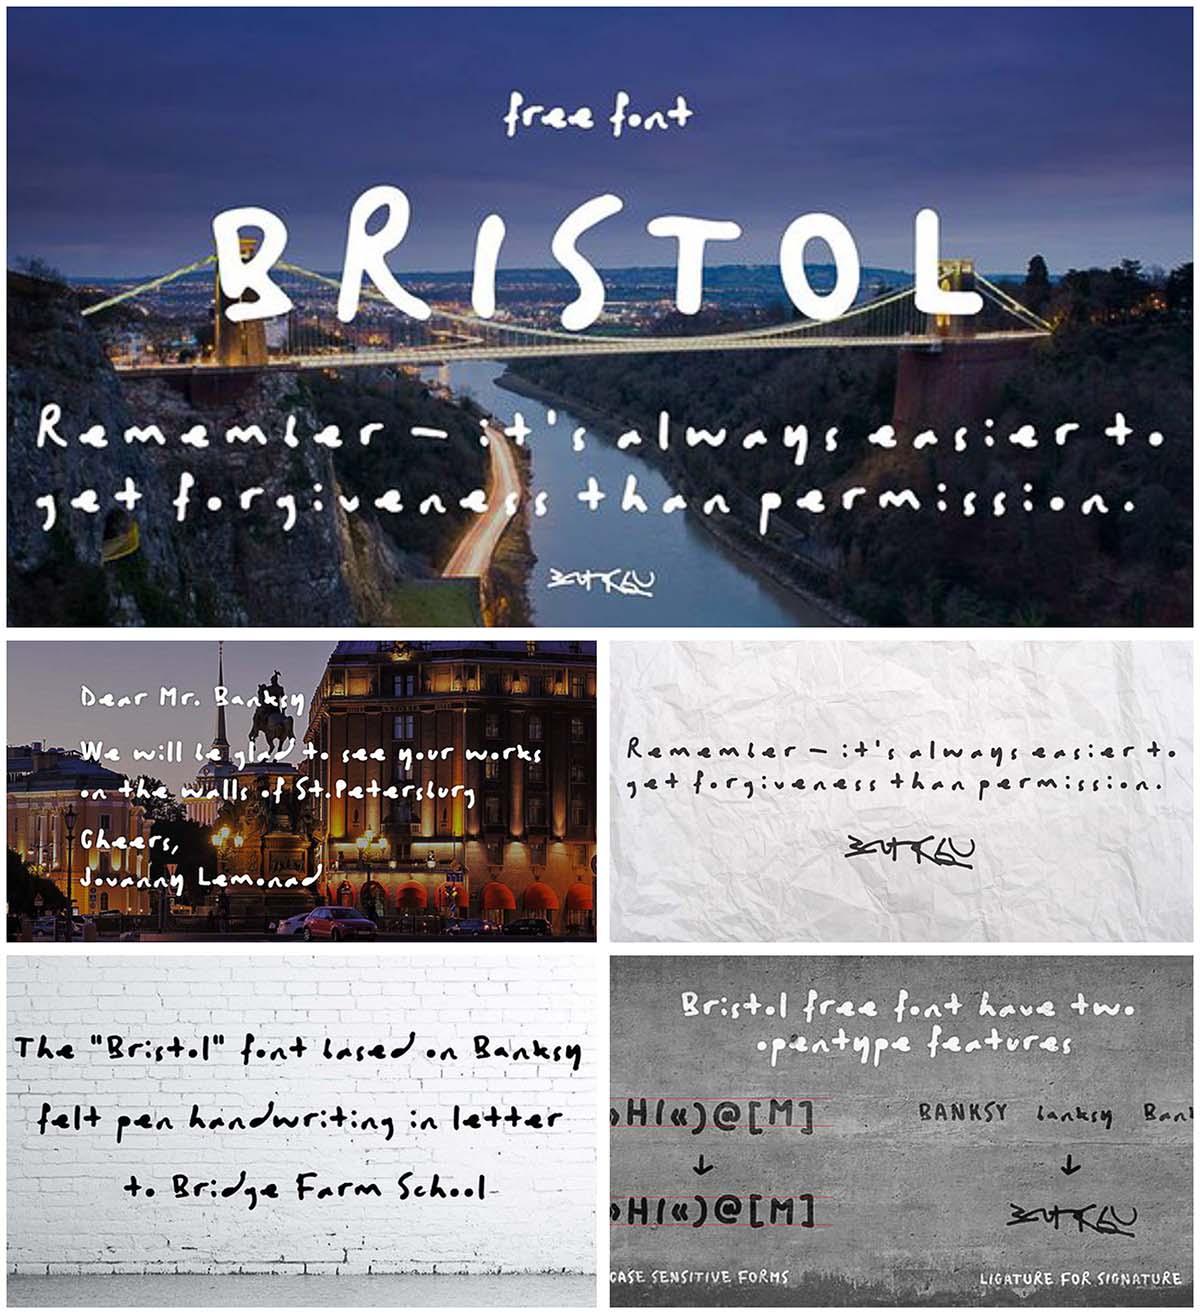 Bristol cyrillic typeface